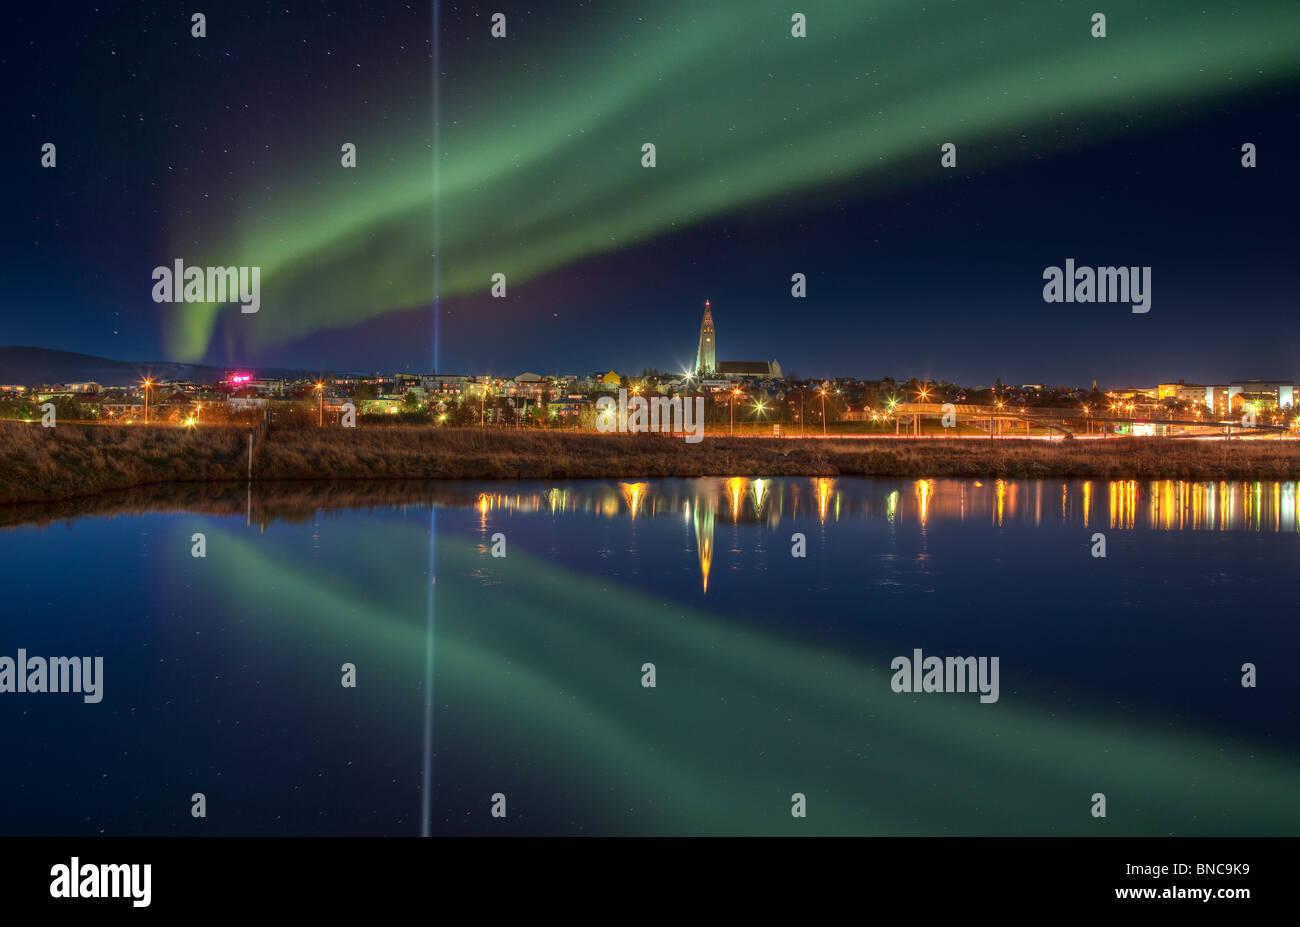 Imagine Peace Tower luz y Aurora Borealis en Reykjavik, Islandia Imagen De Stock